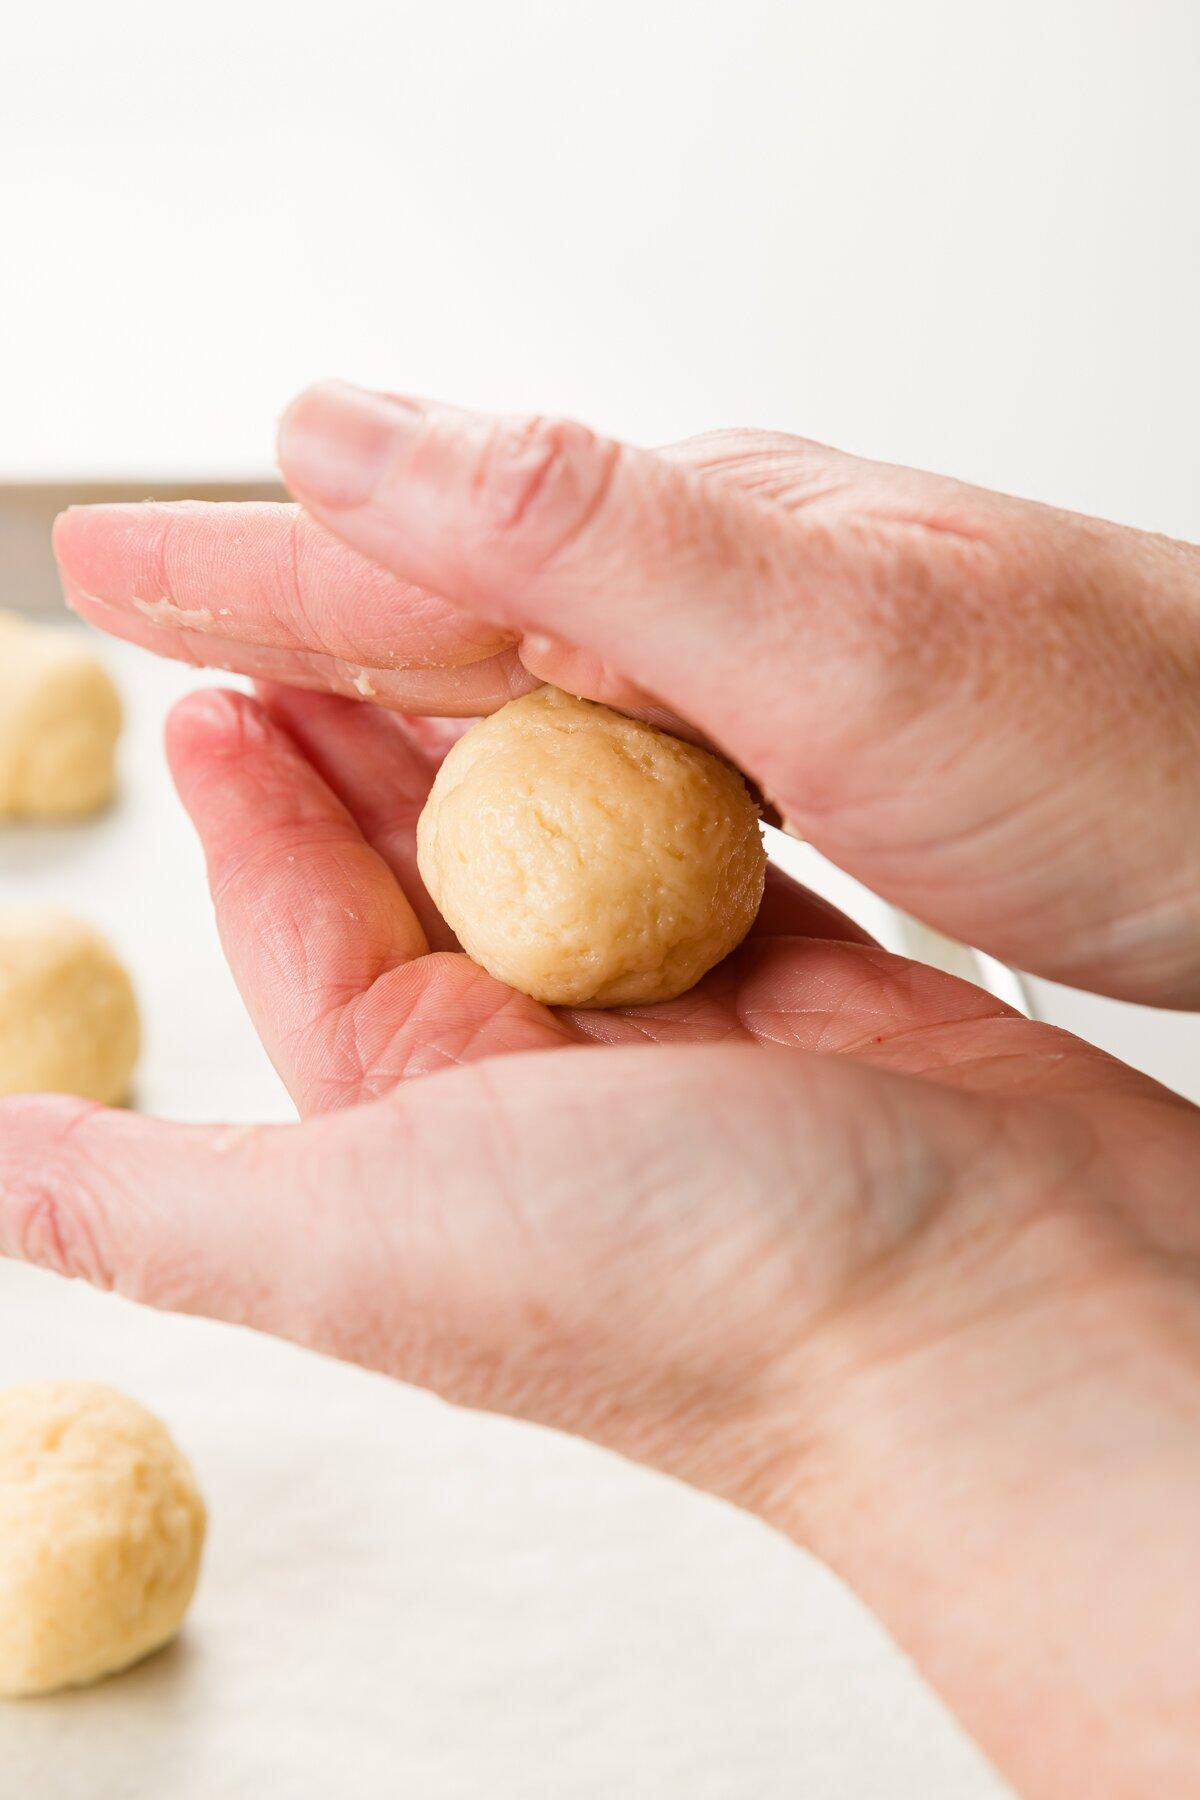 Rolling cookie dough ball between two hands